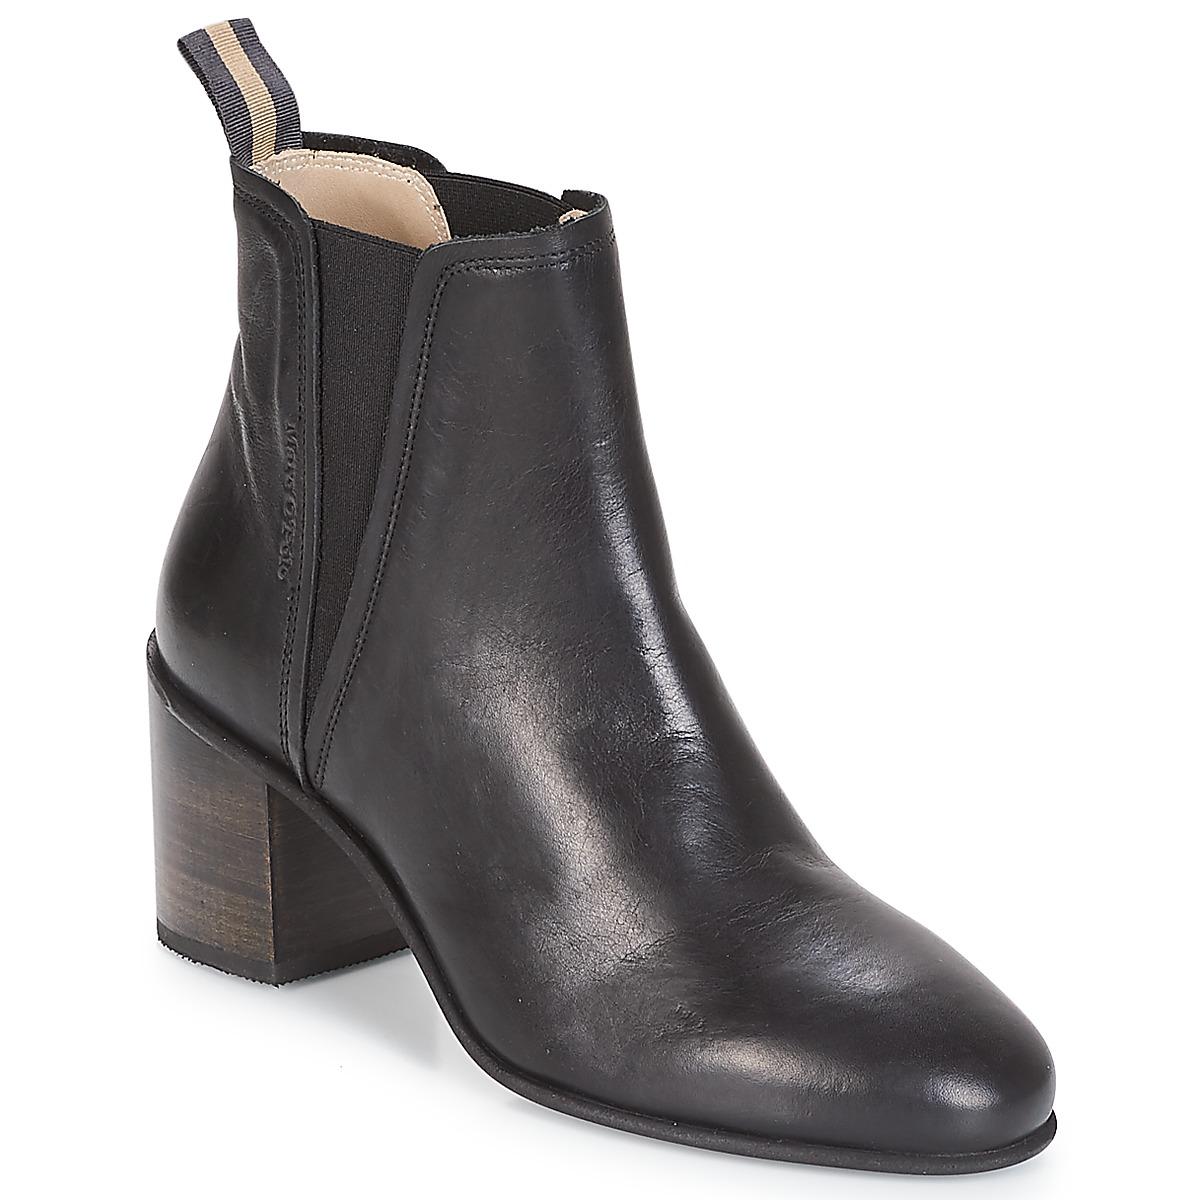 Marc O'Polo CAROLINA Schwarz - Kostenloser Versand bei Spartoode ! - Schuhe Low Boots Damen 189,00 €